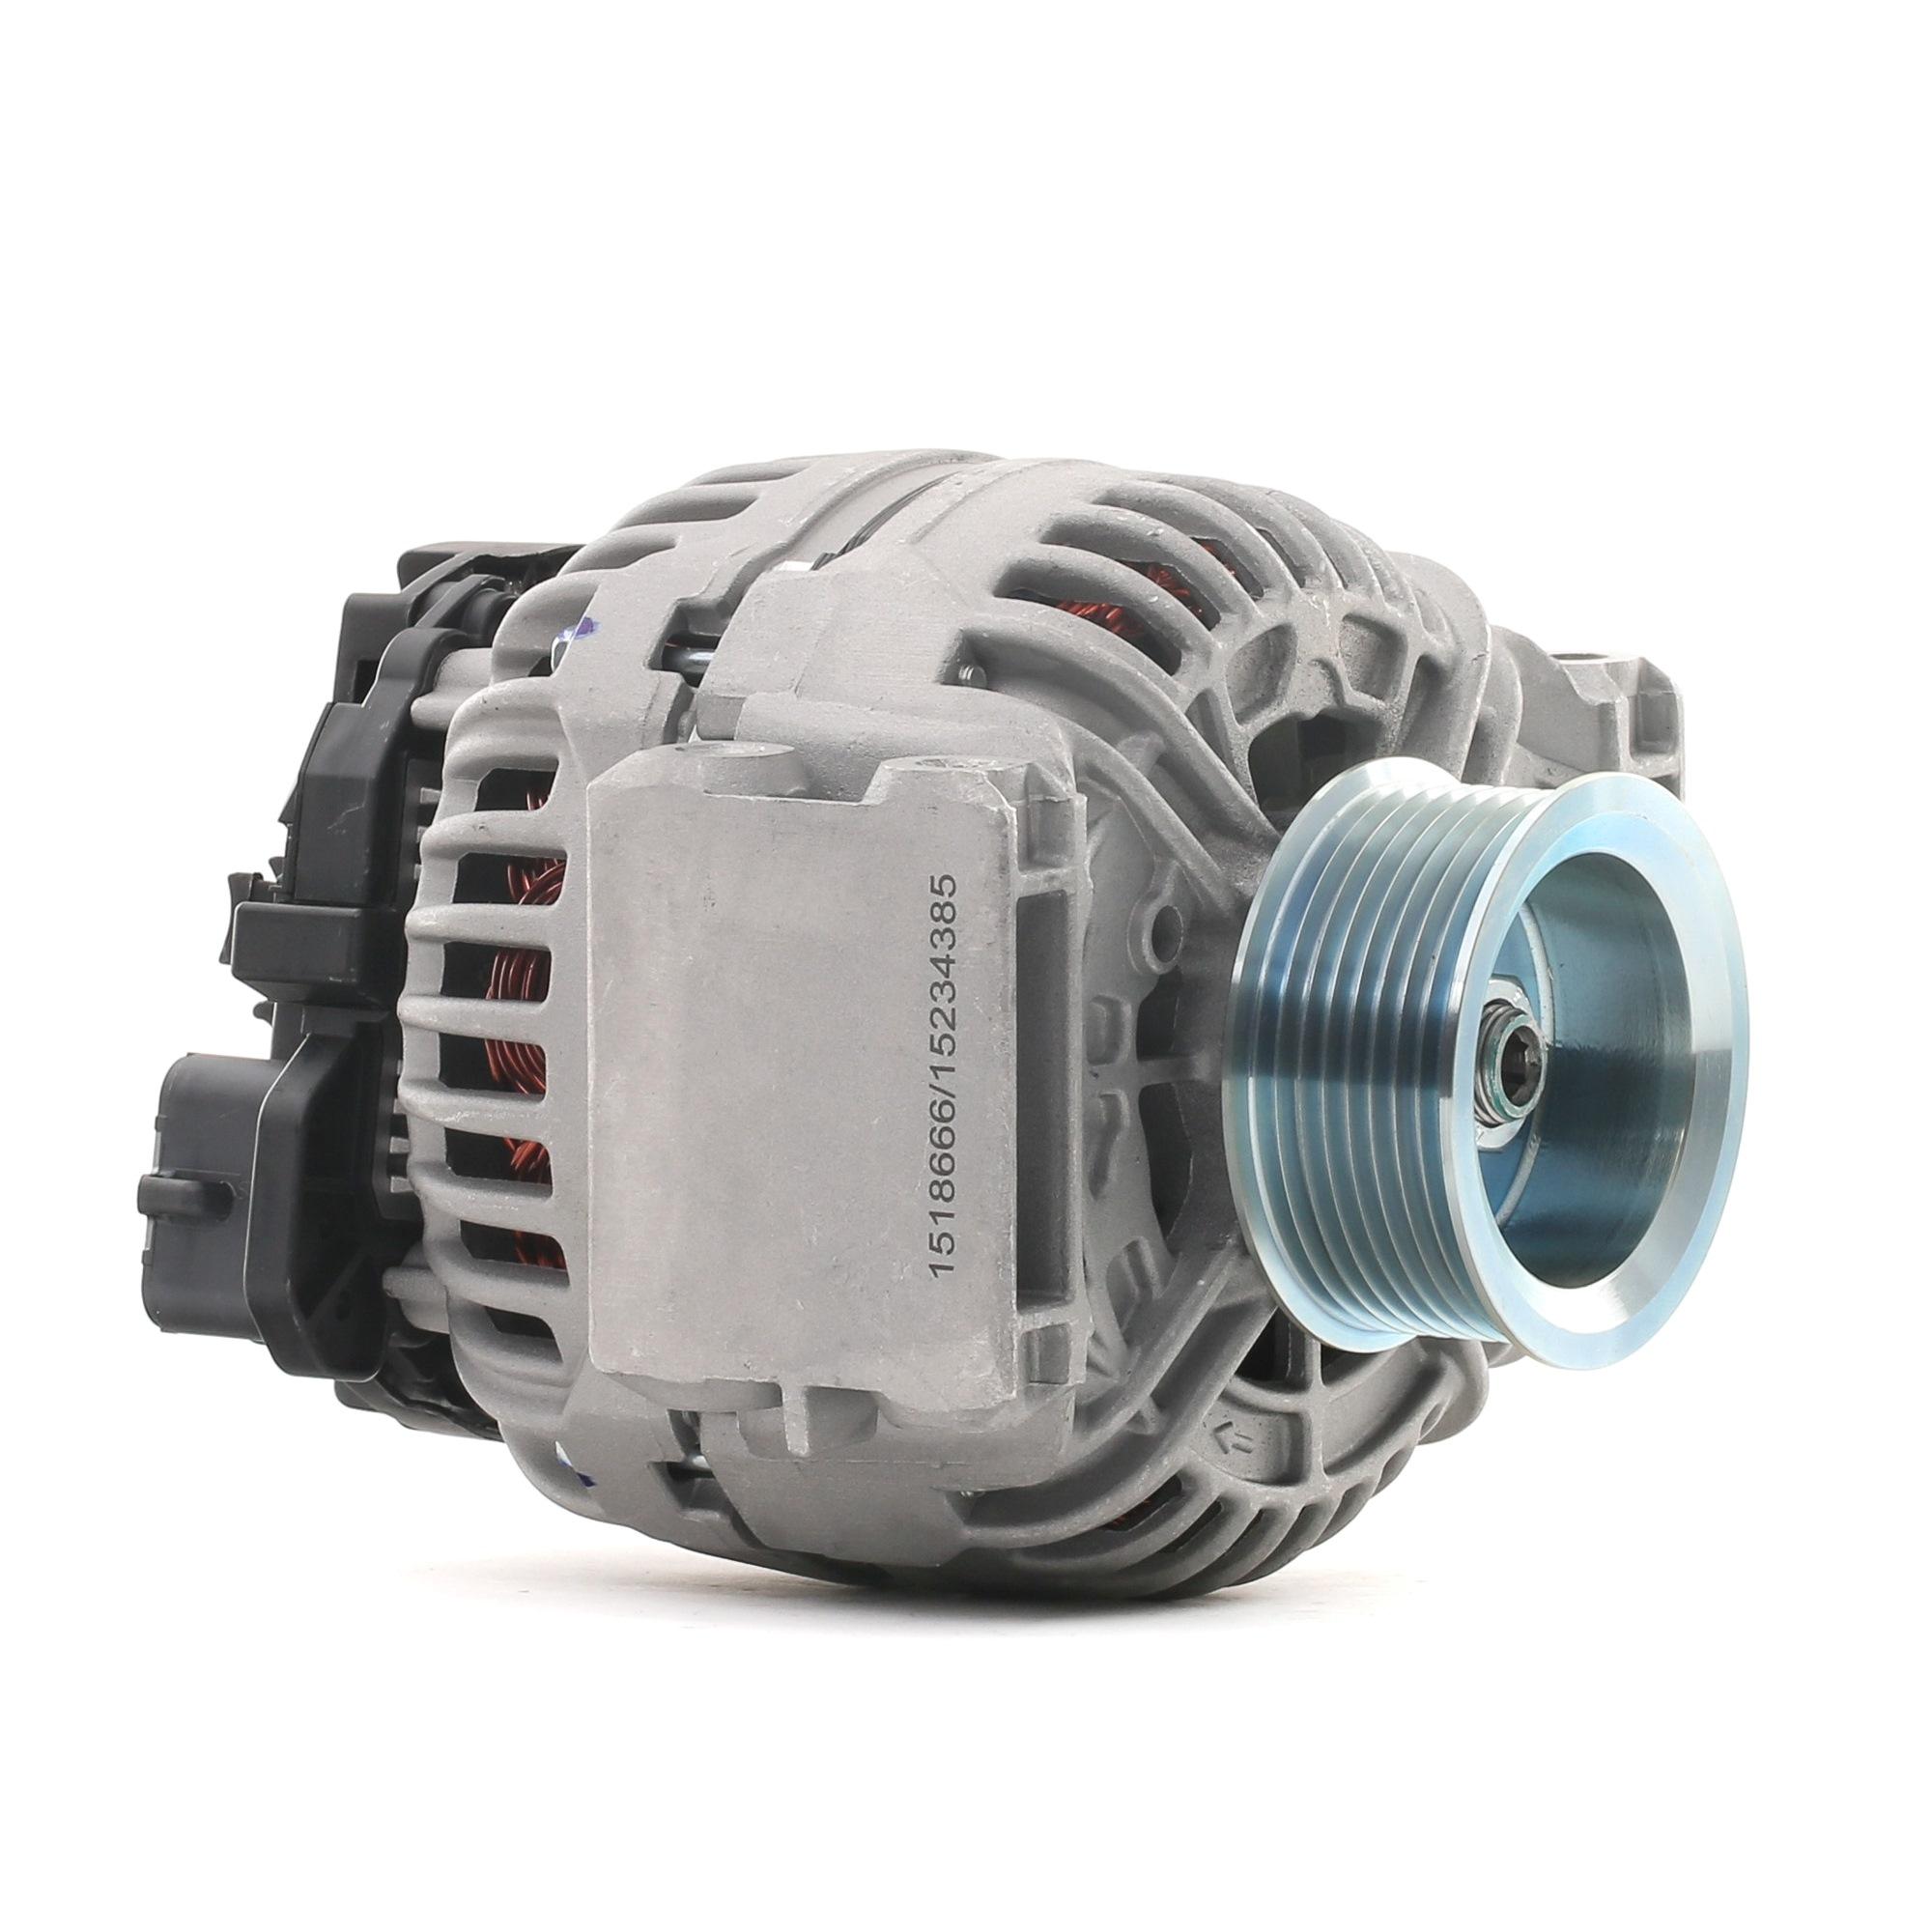 RIDEX Alternator do SCANIA - numer produktu: 4G0933